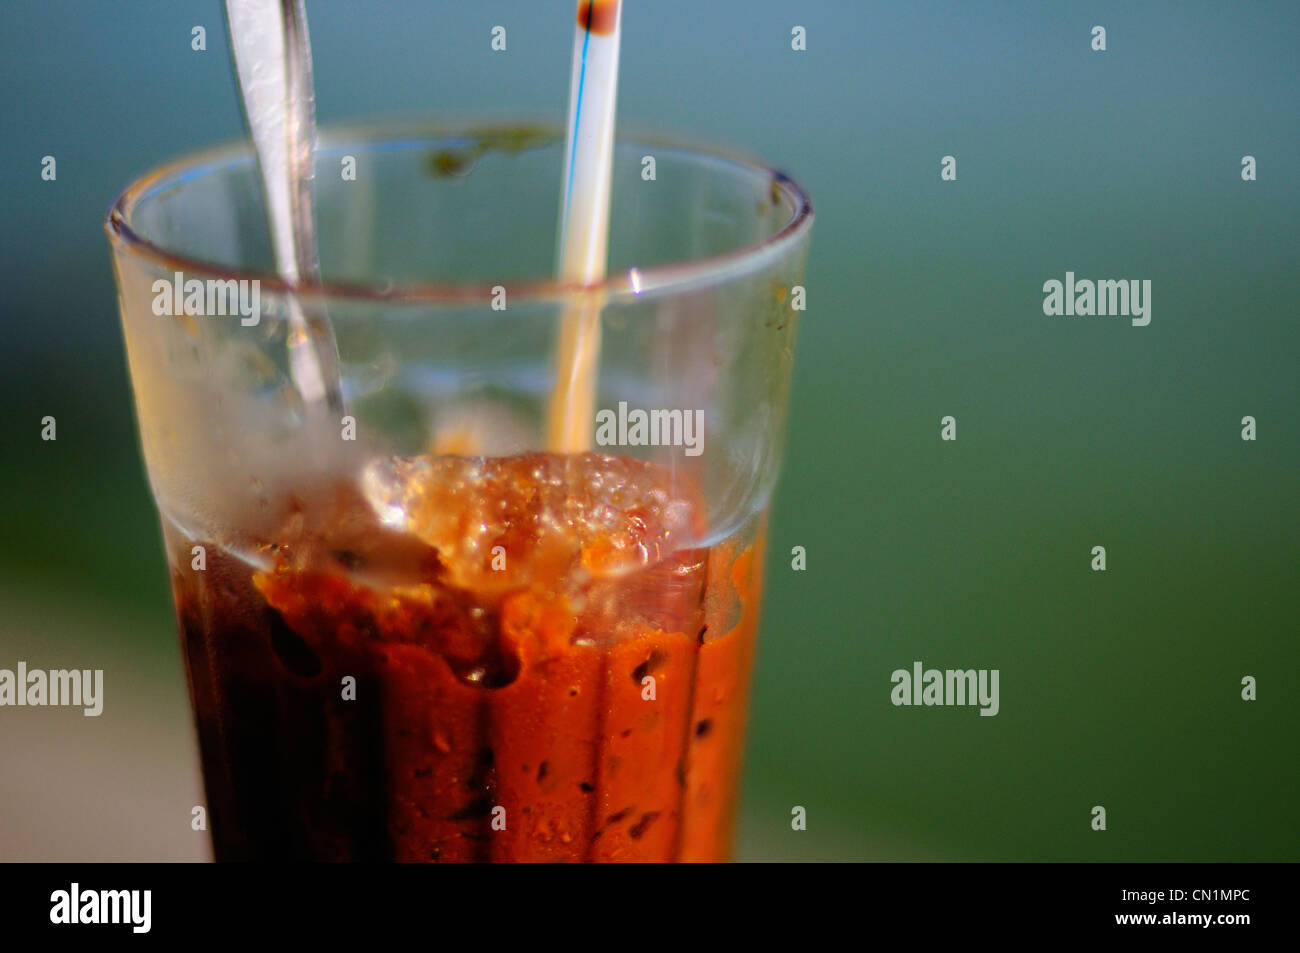 Vietnamese iced coffee with condensed milk (cà phê sữa đá) - Stock Image